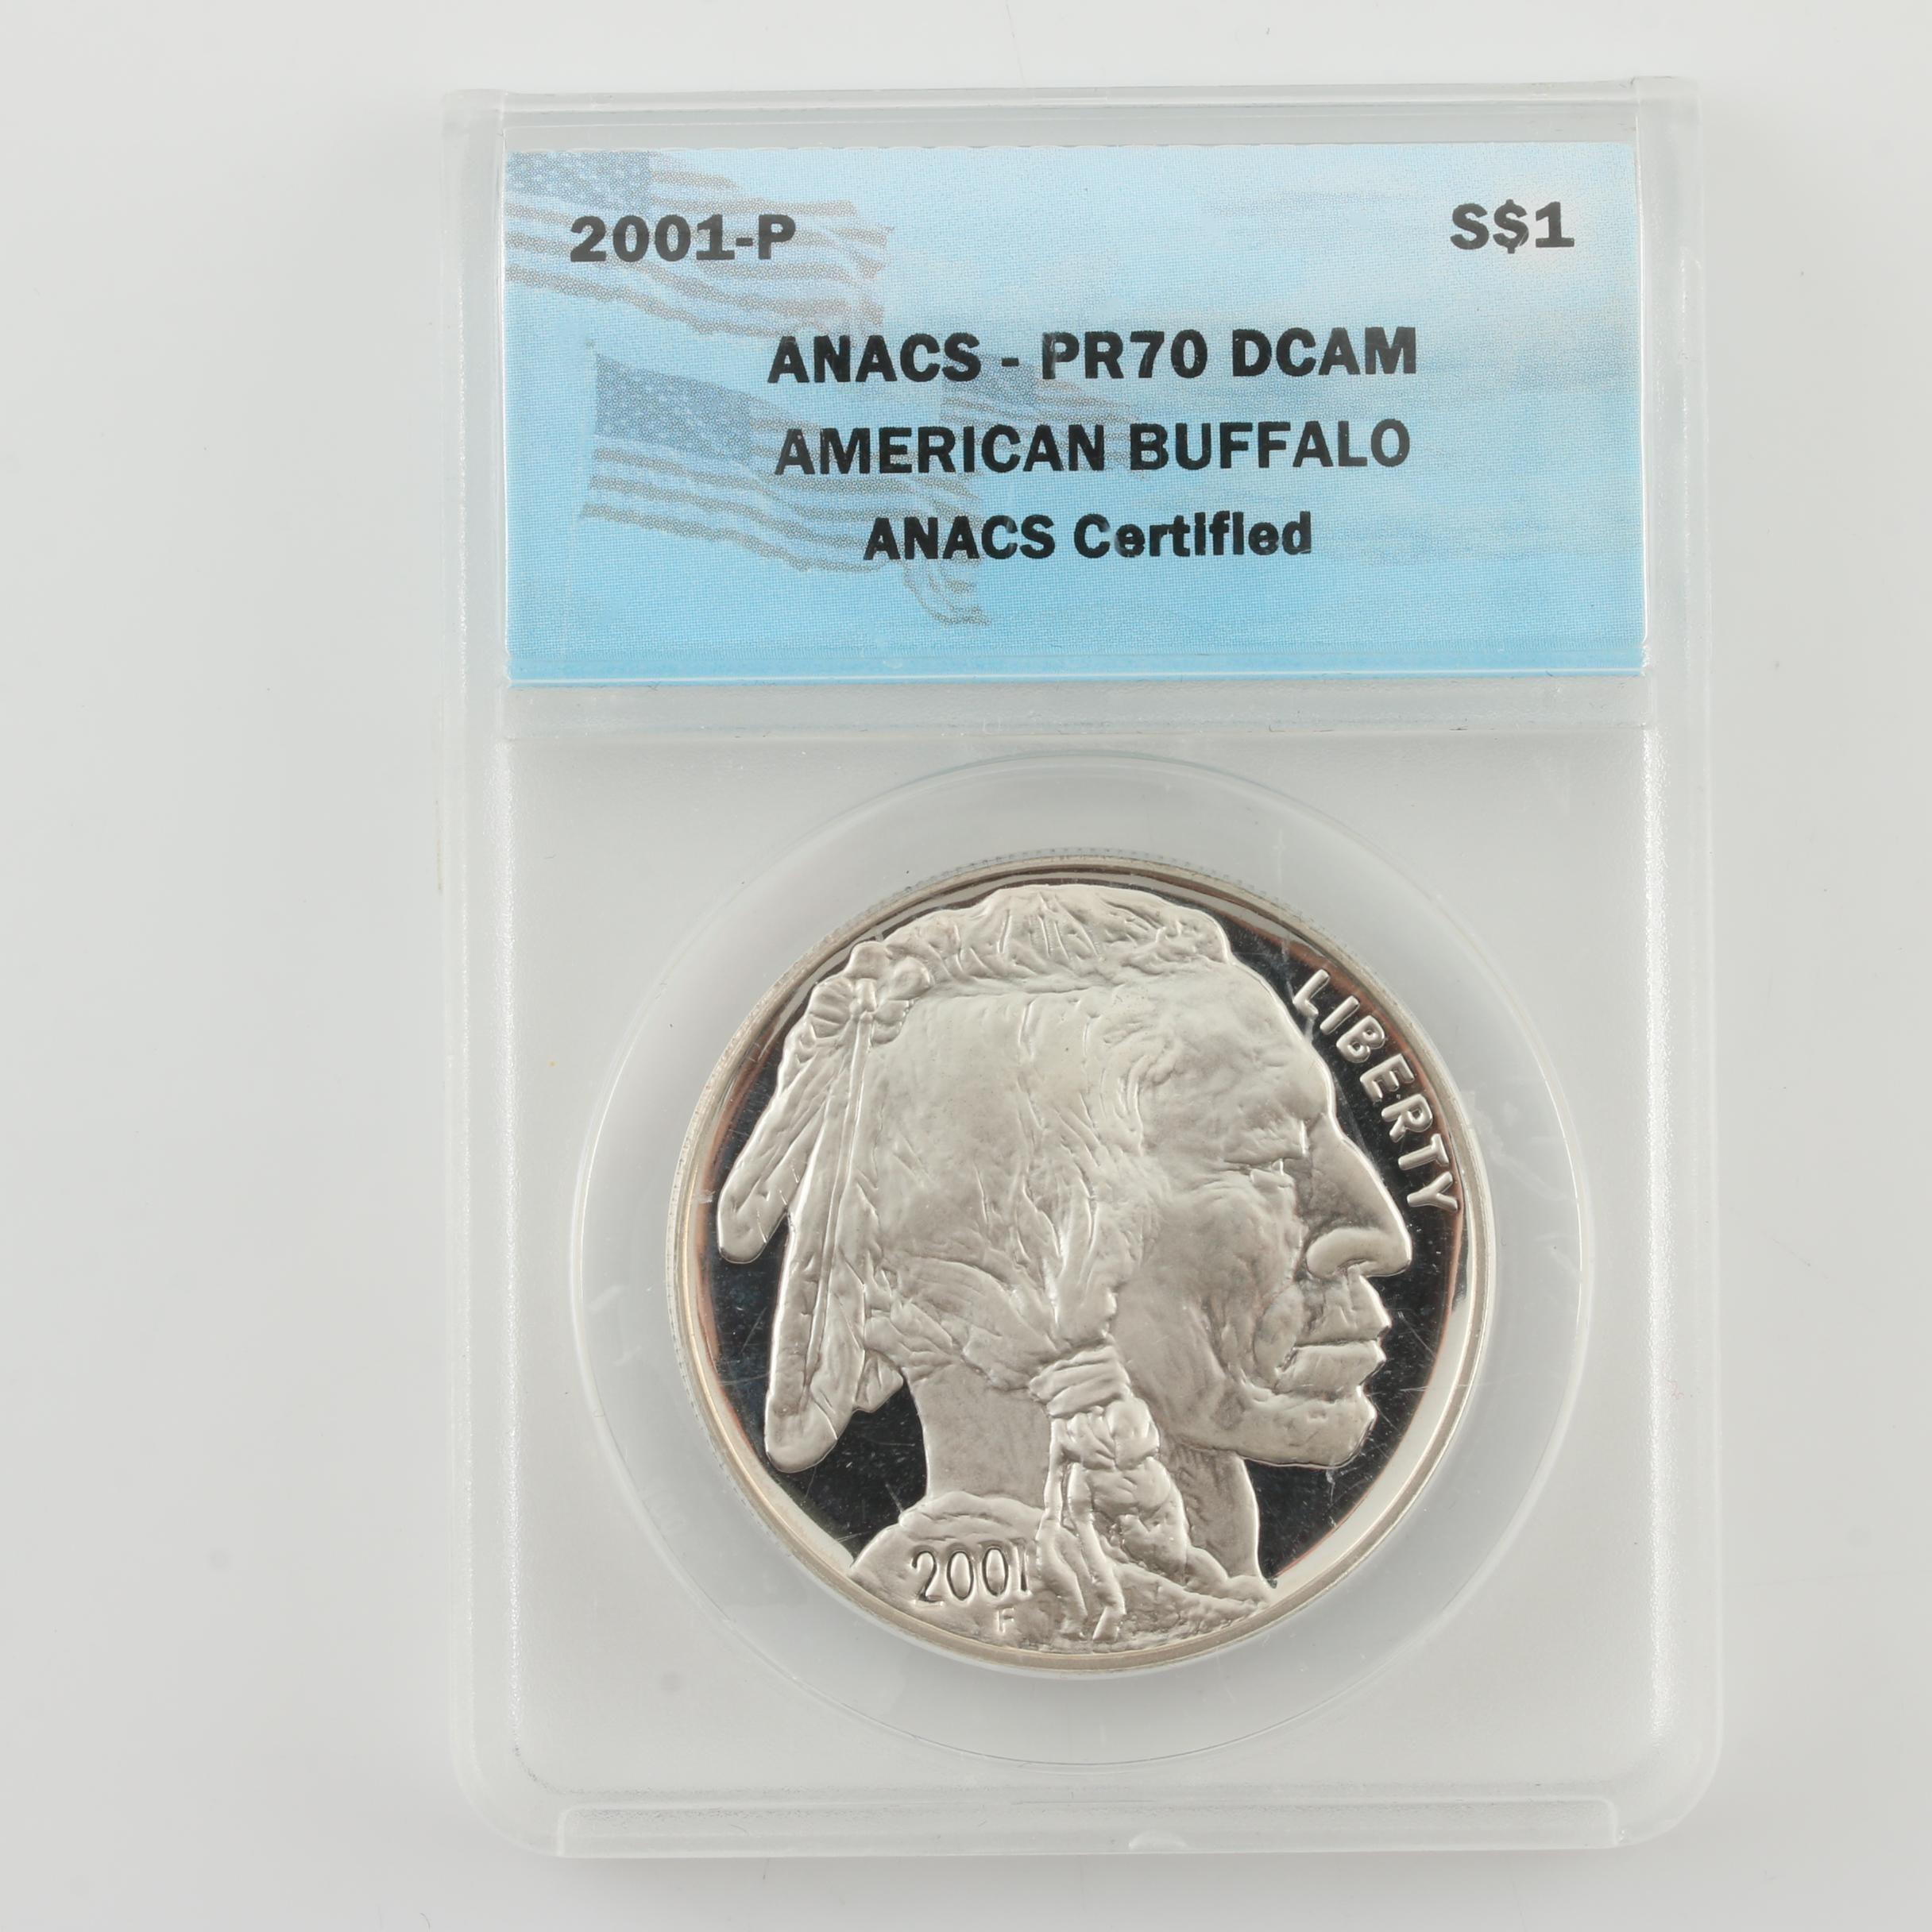 ANACS Graded PR70 DCAM U.S. American Buffalo Silver Dollar Proof Coin